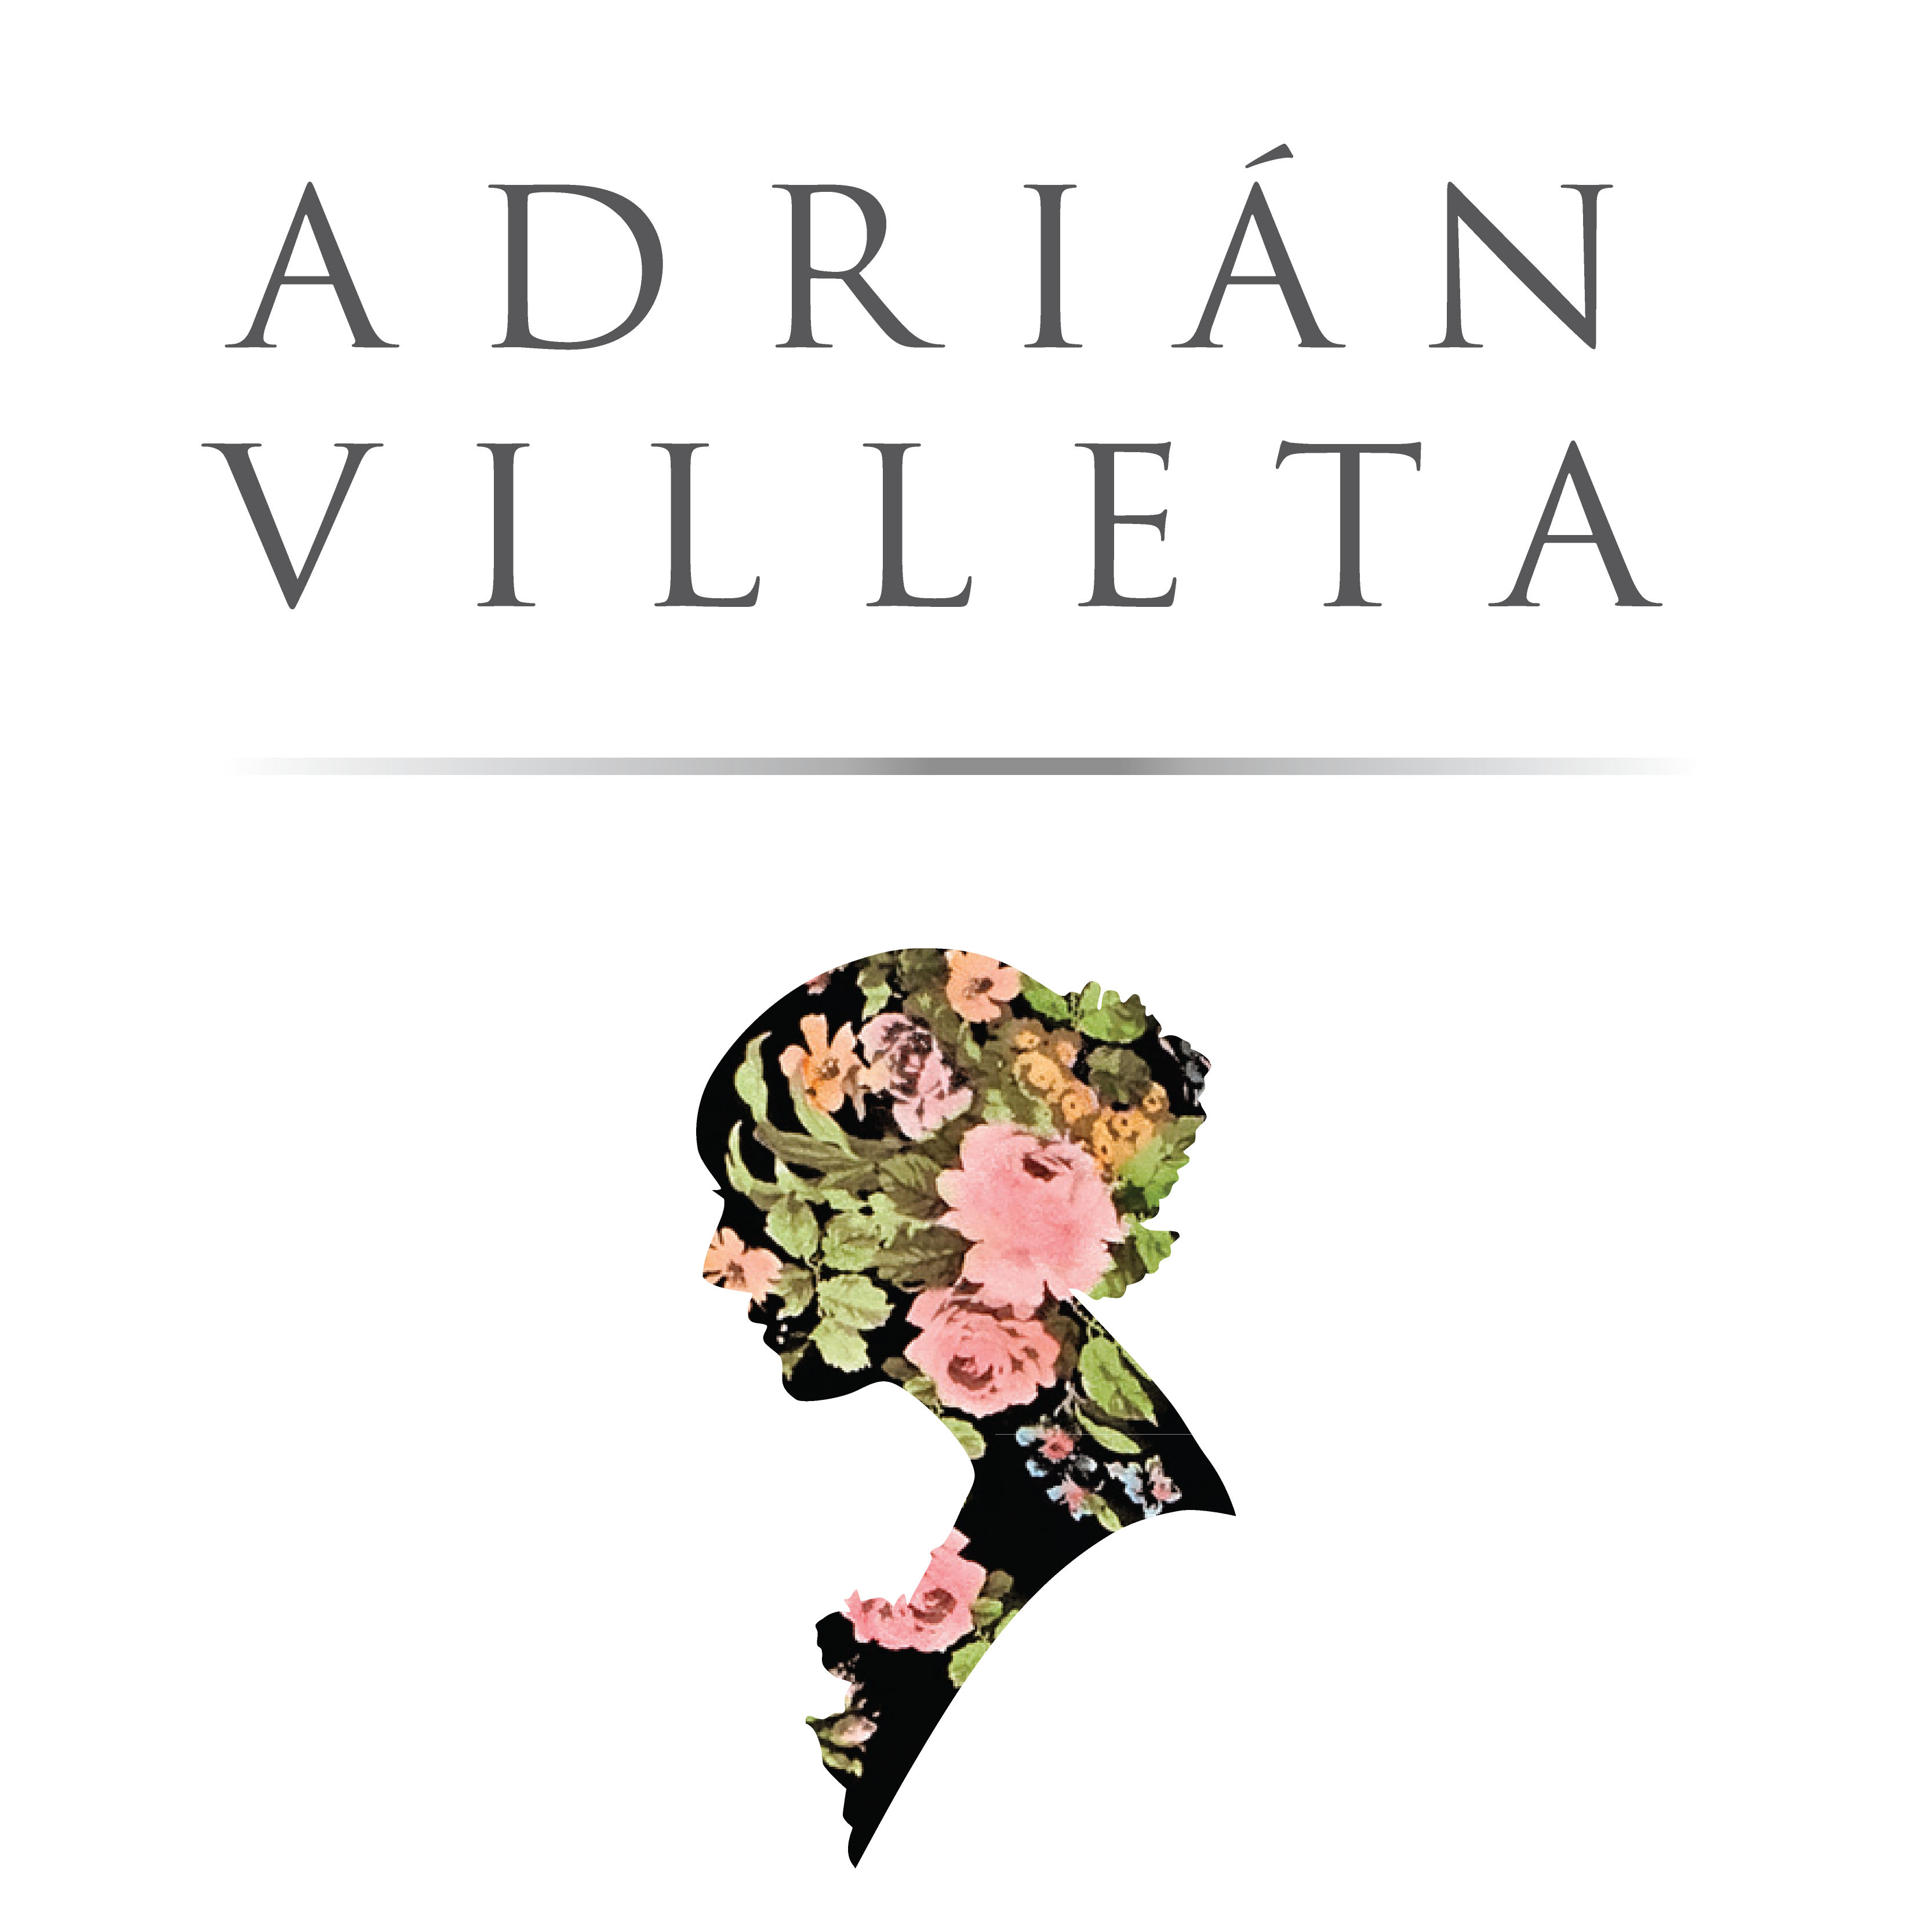 Adrián Villeta